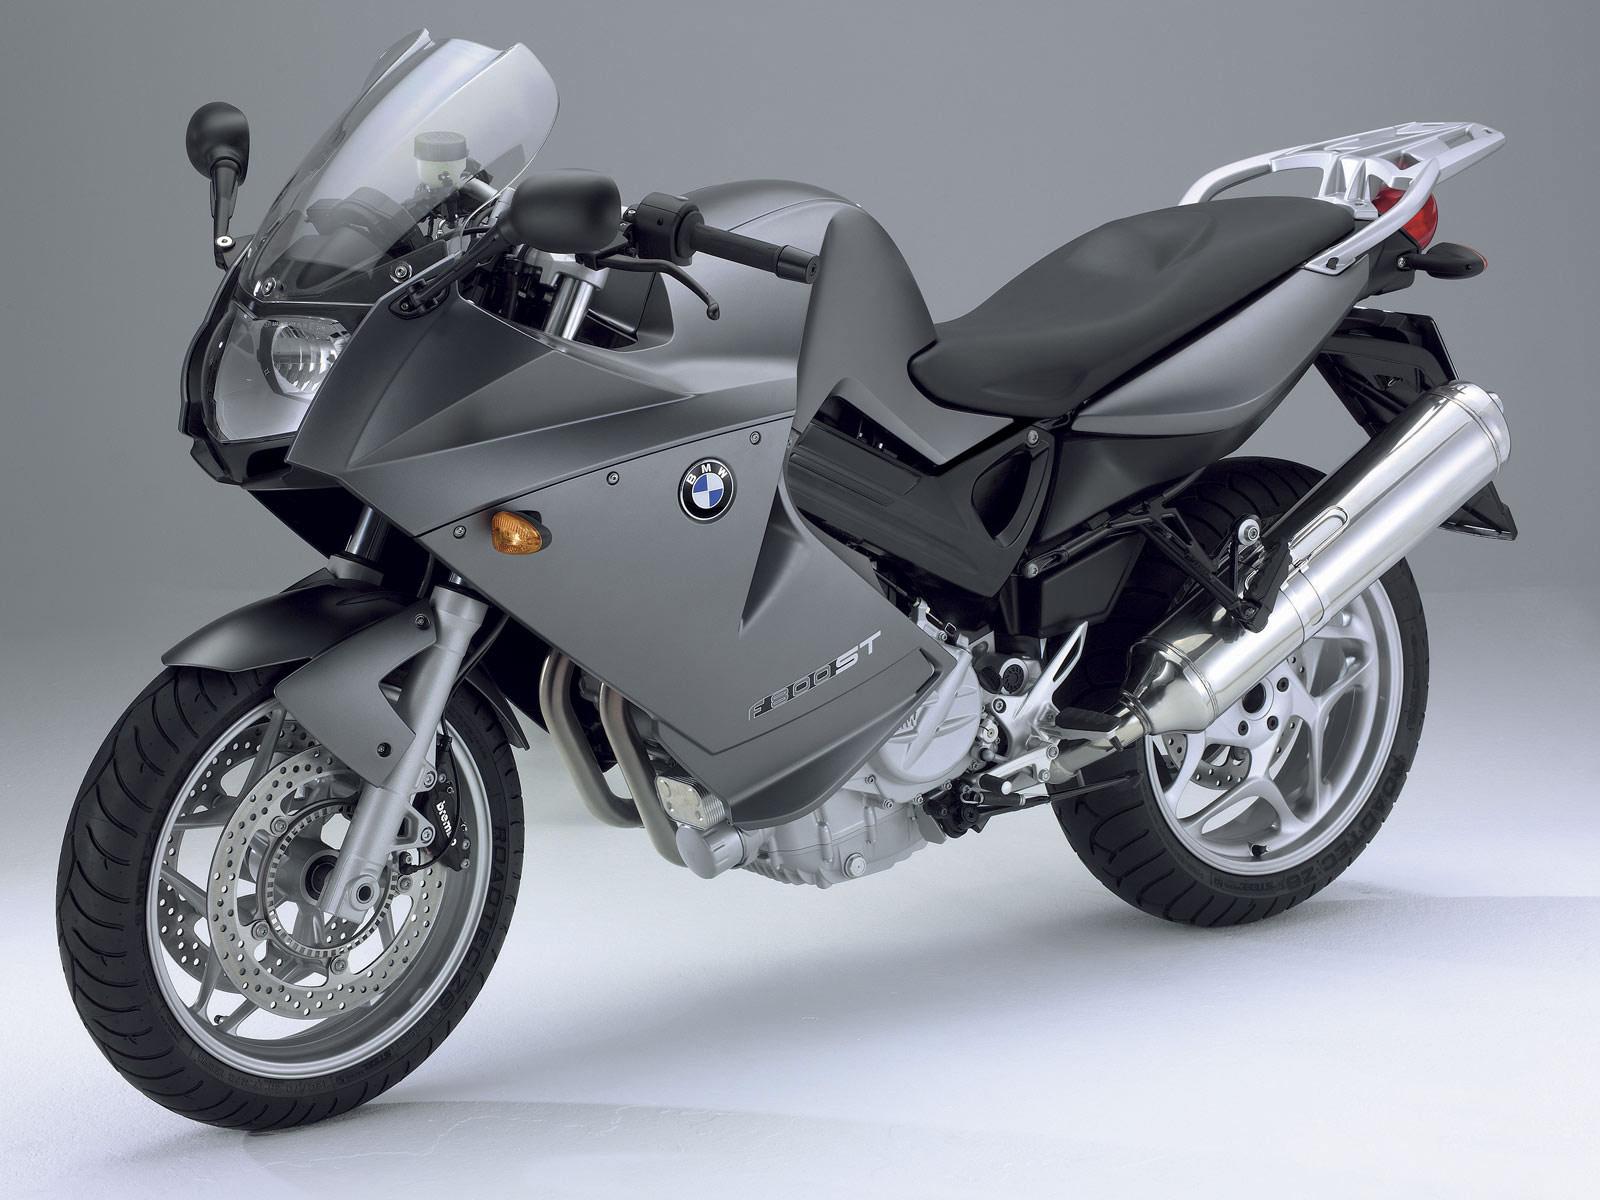 2006 BMW F800 ST Motorcycle Desktop Wallpaper 1600x1200